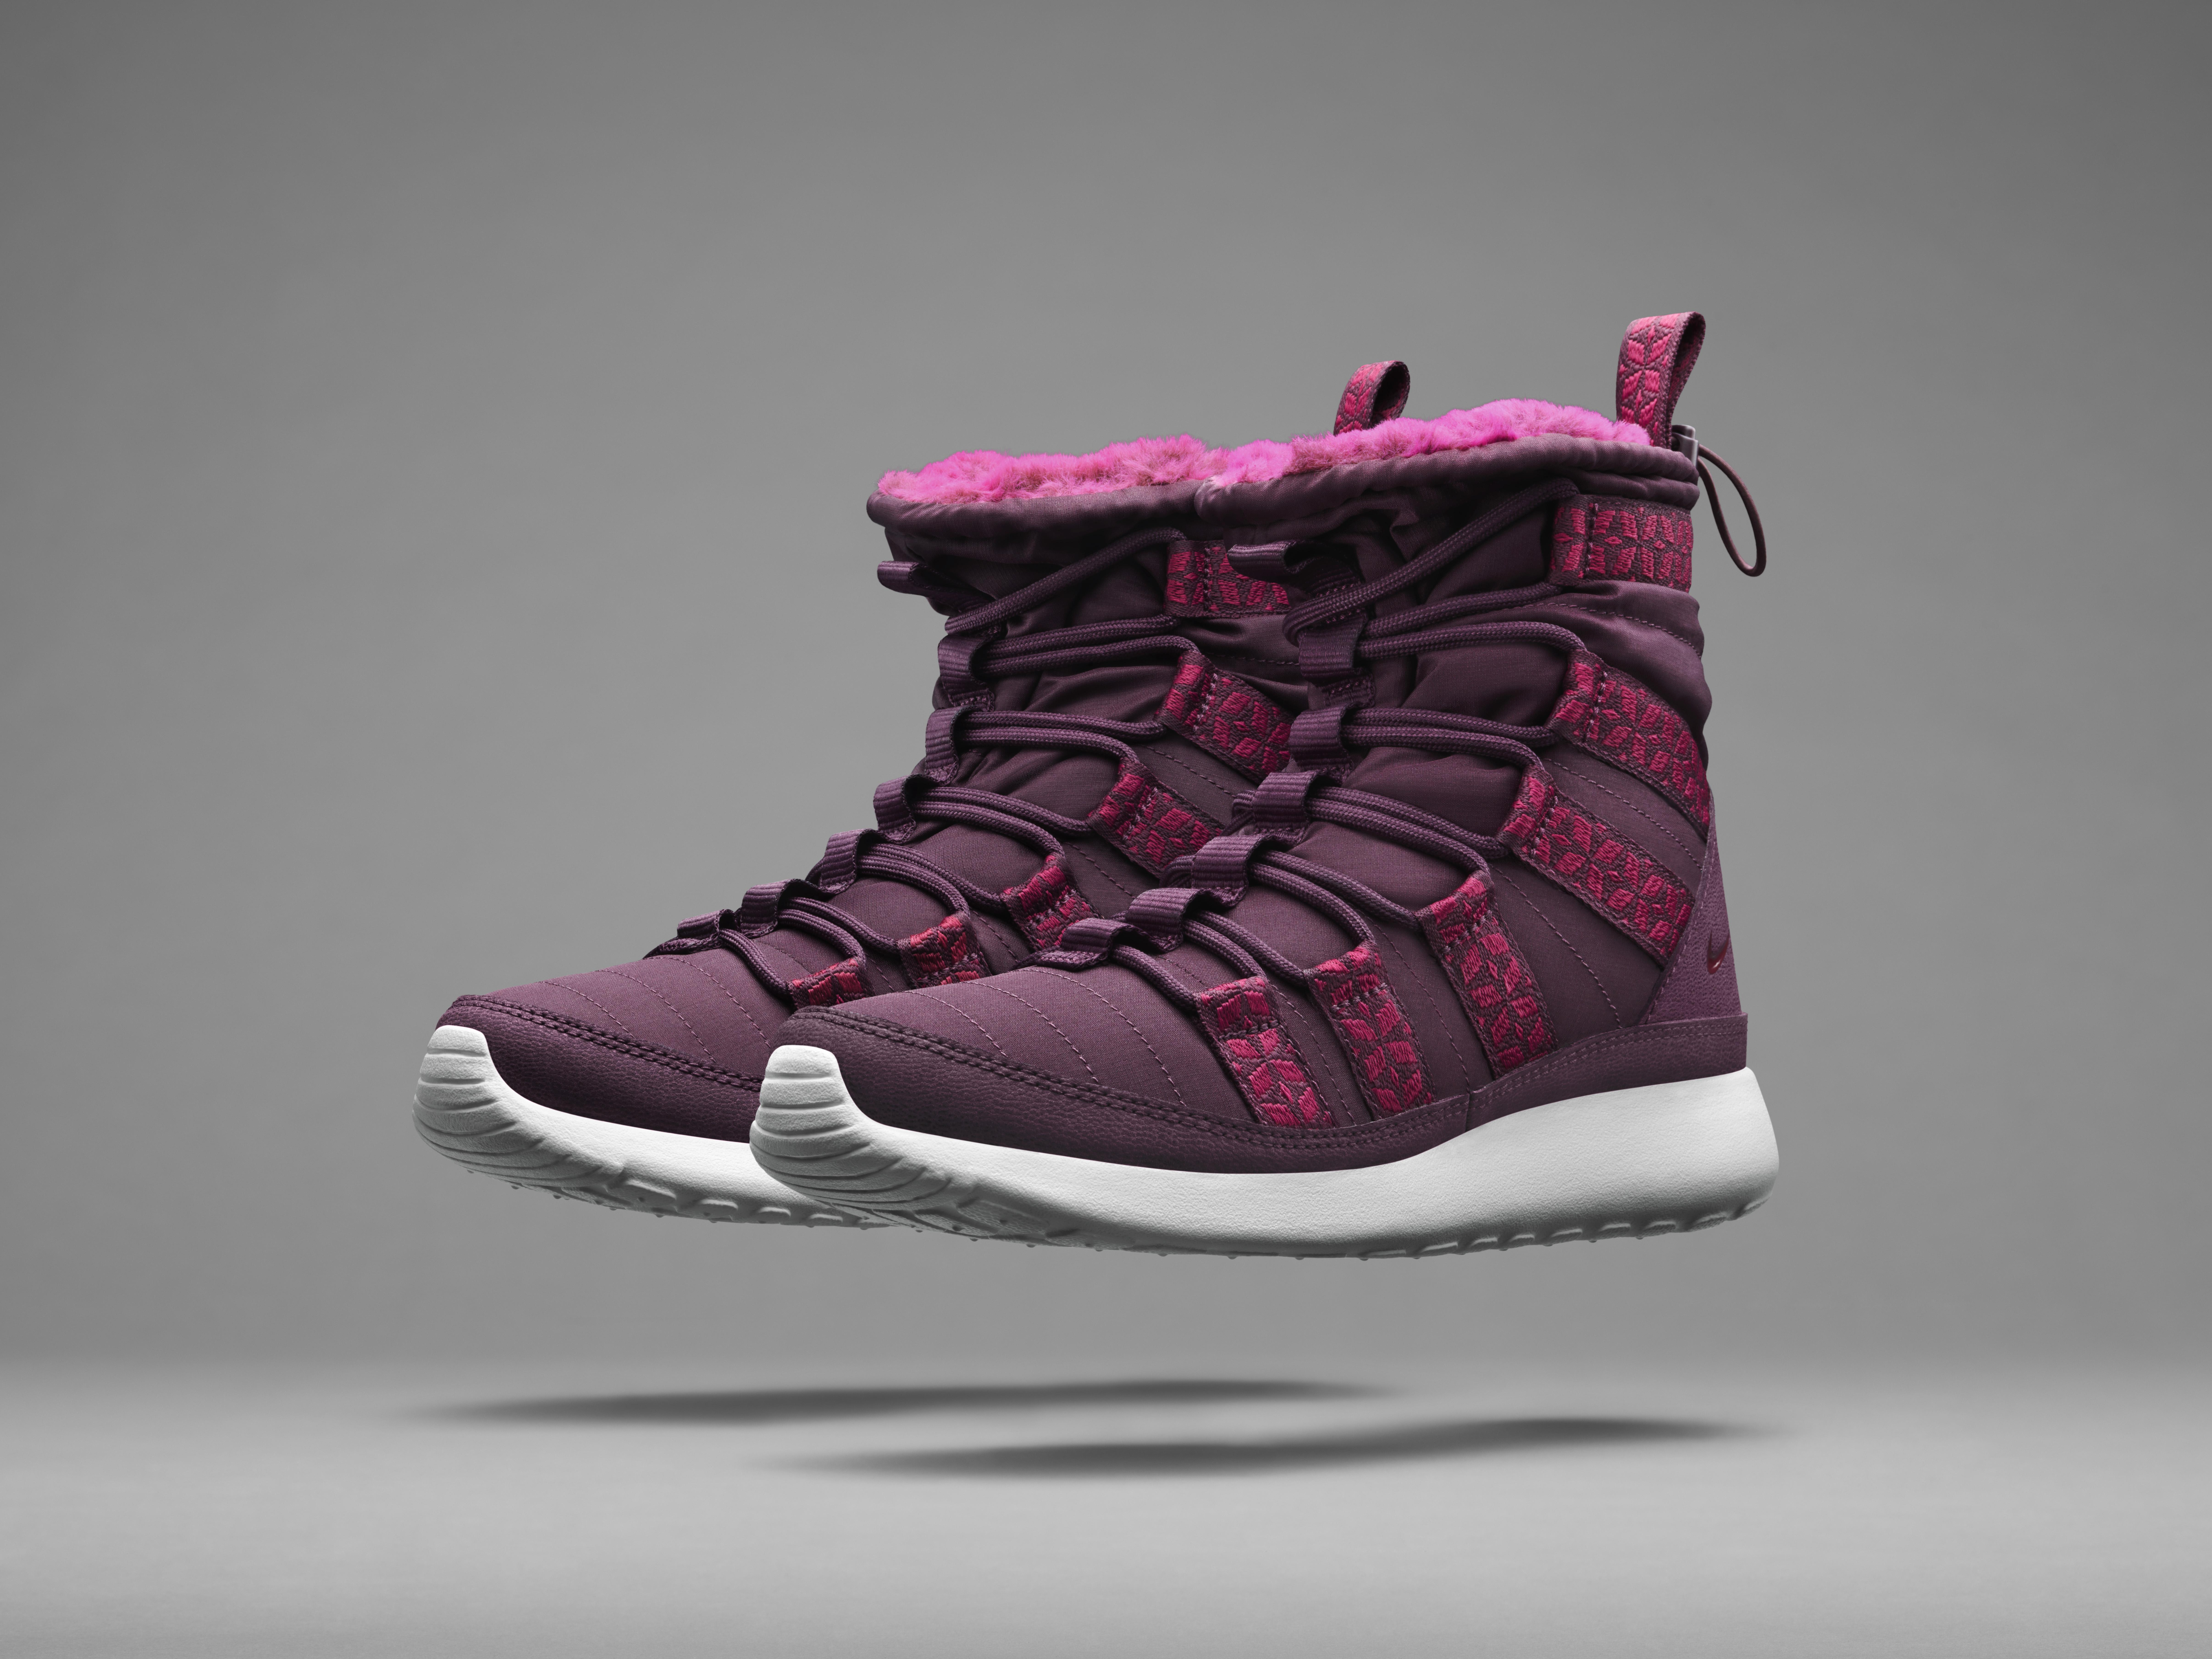 Nike Roshe Run High Sneakerboot